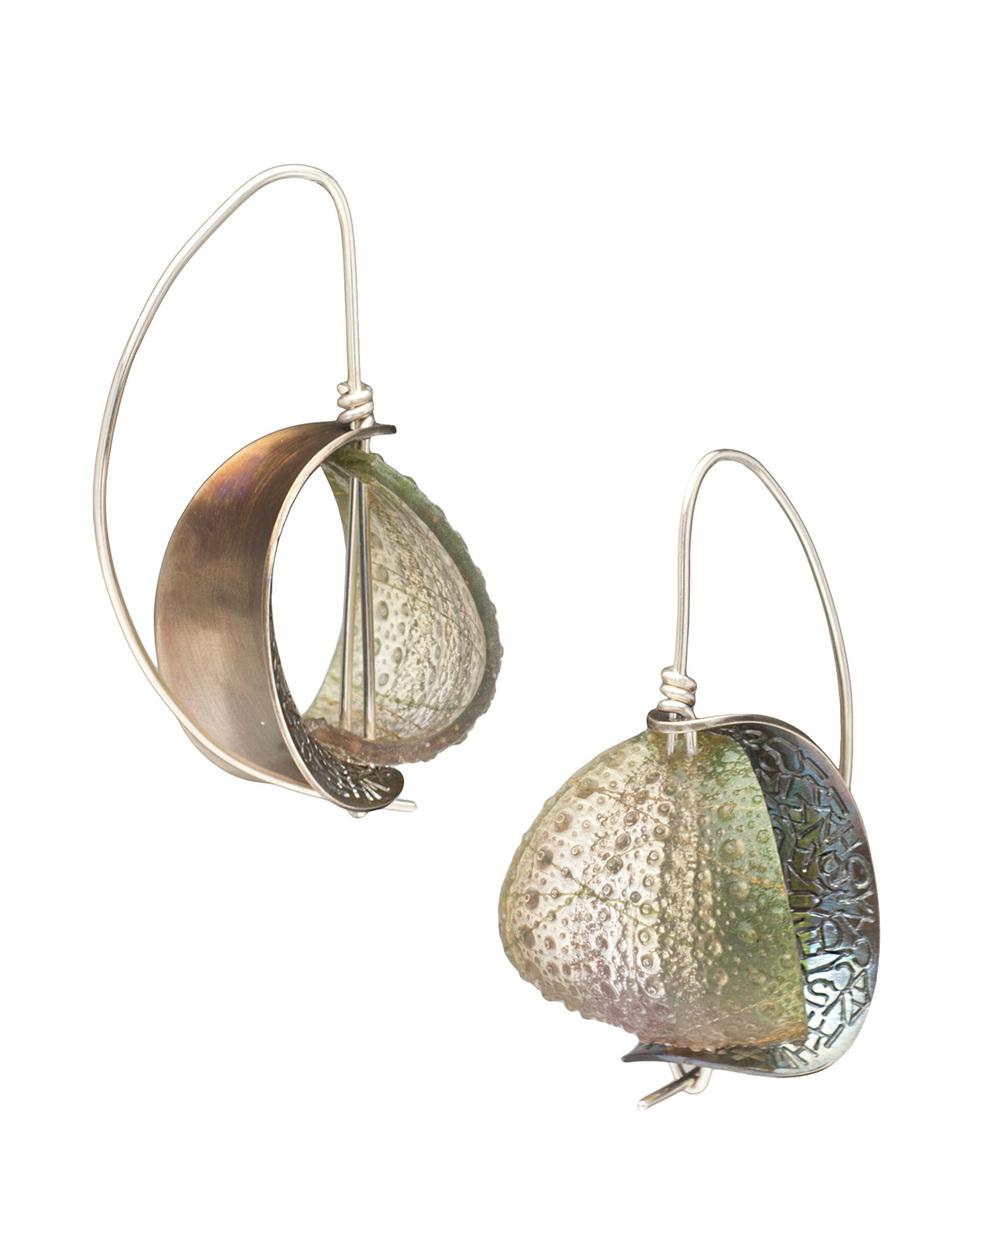 2015-10-Mary-Lynn-Podiluk-Retroflex-Earrings-12a.jpg